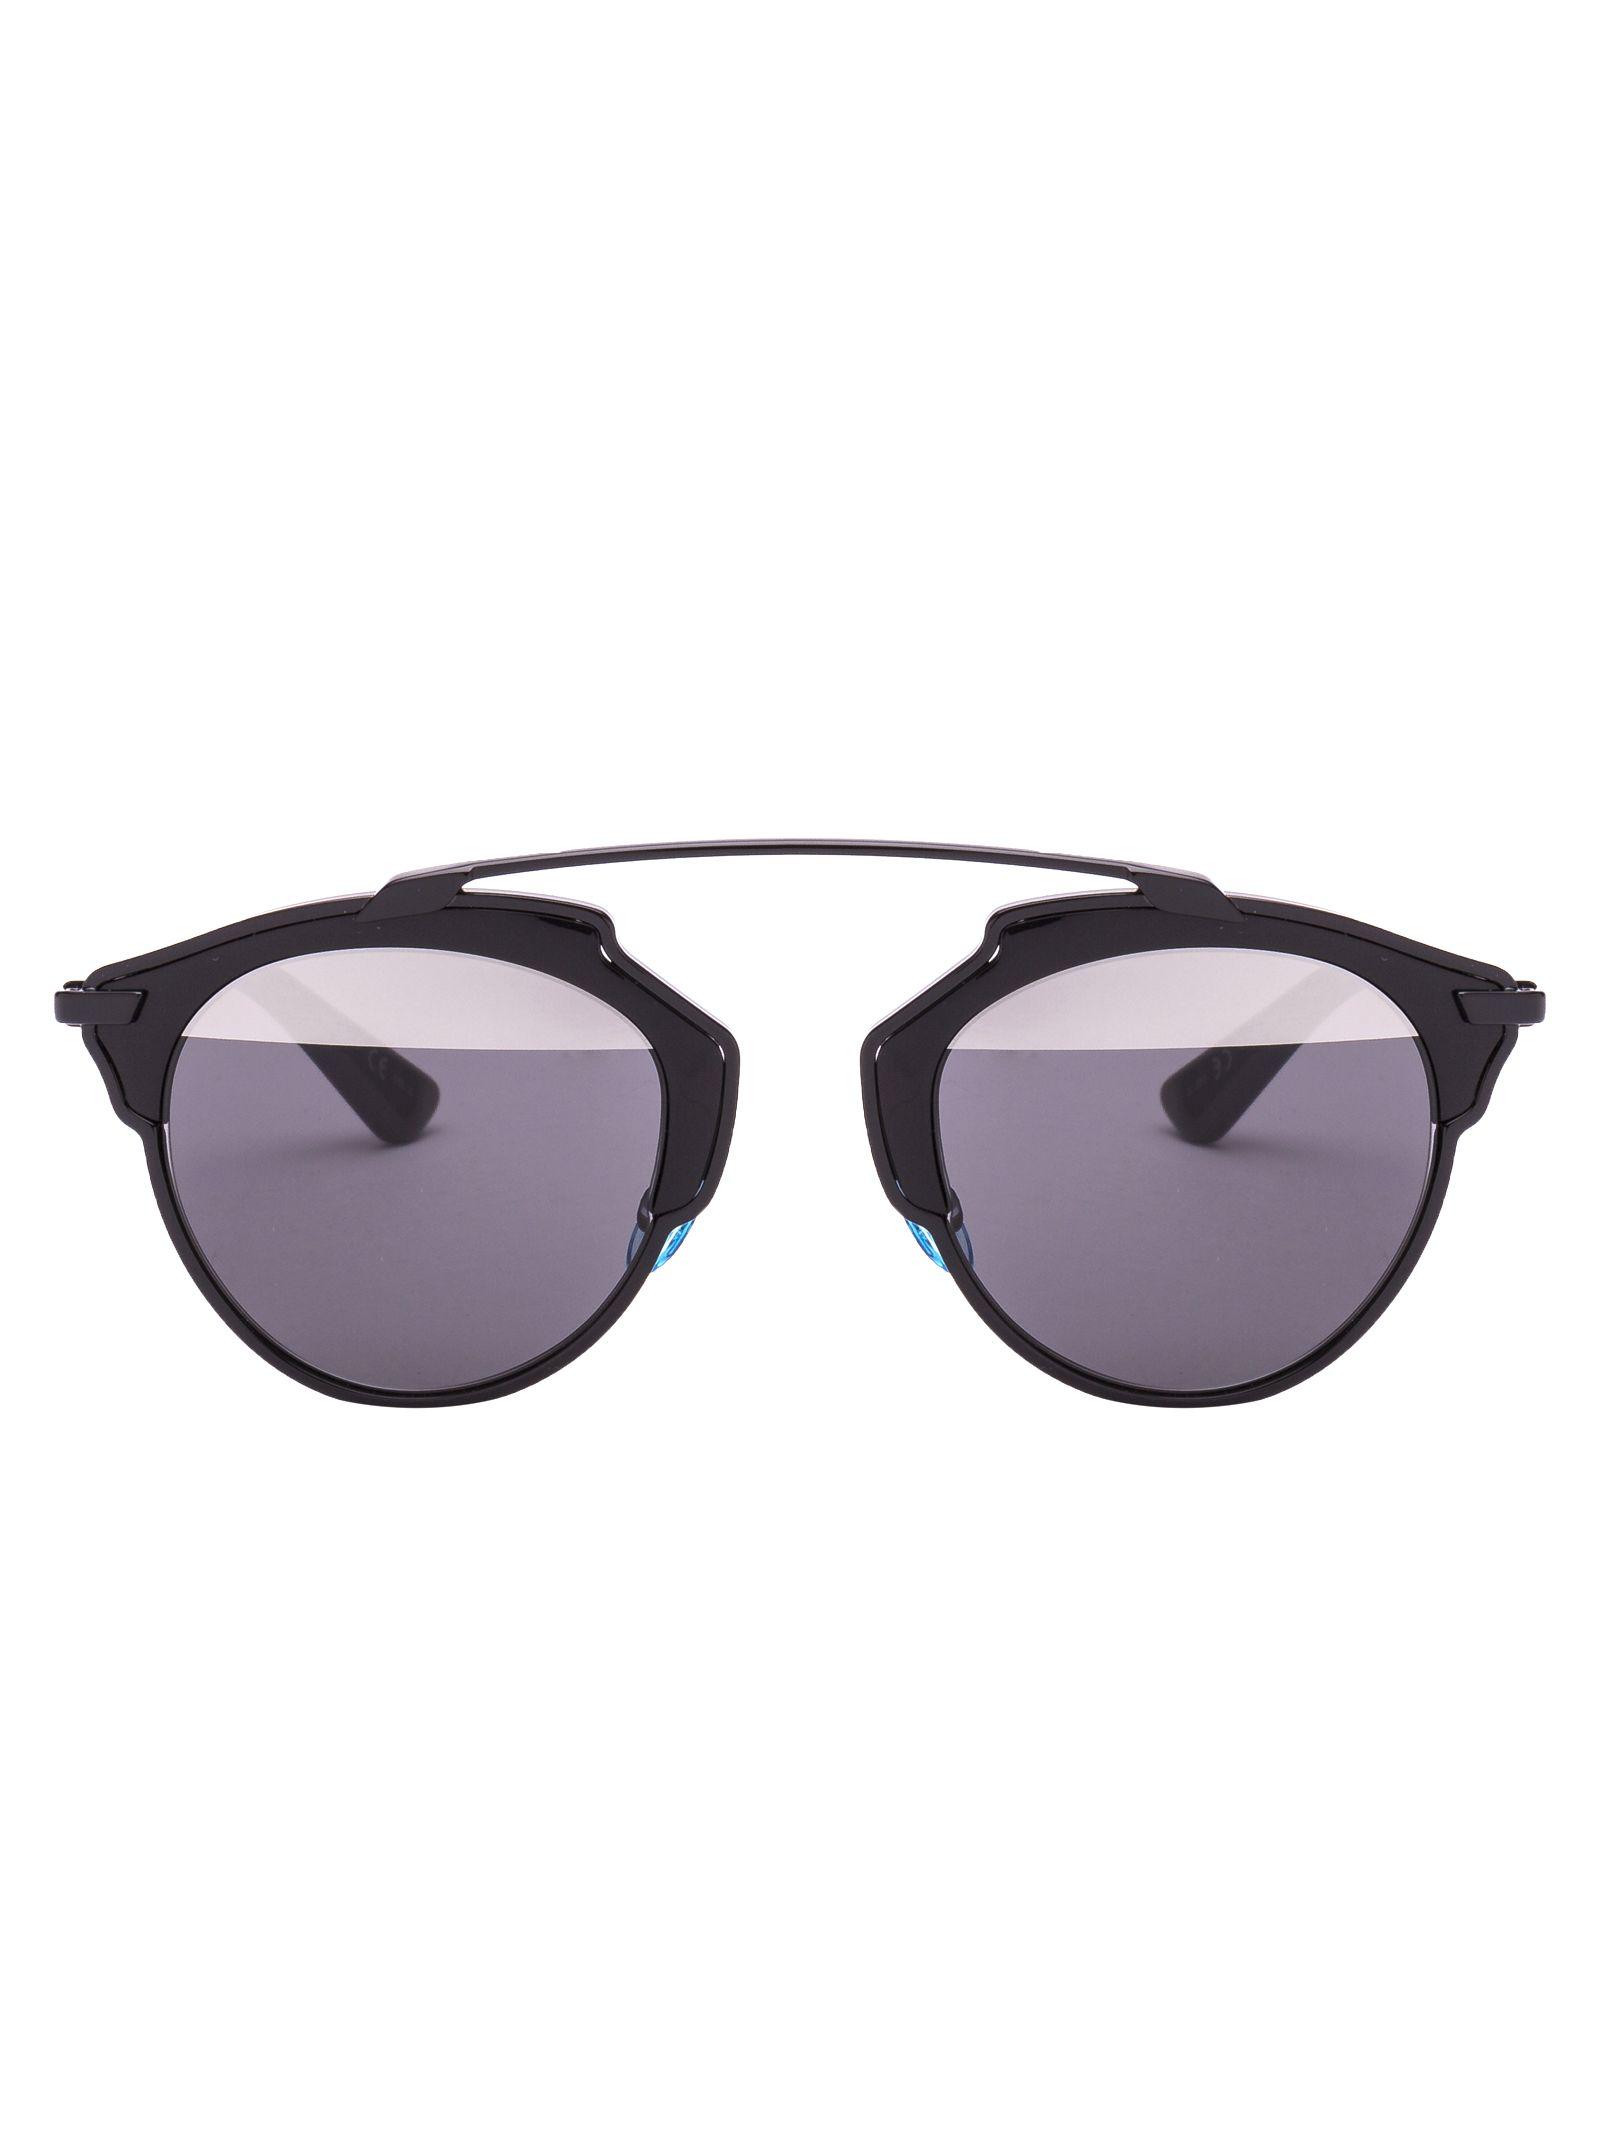 Dior Eyewear So Real Sunglasses